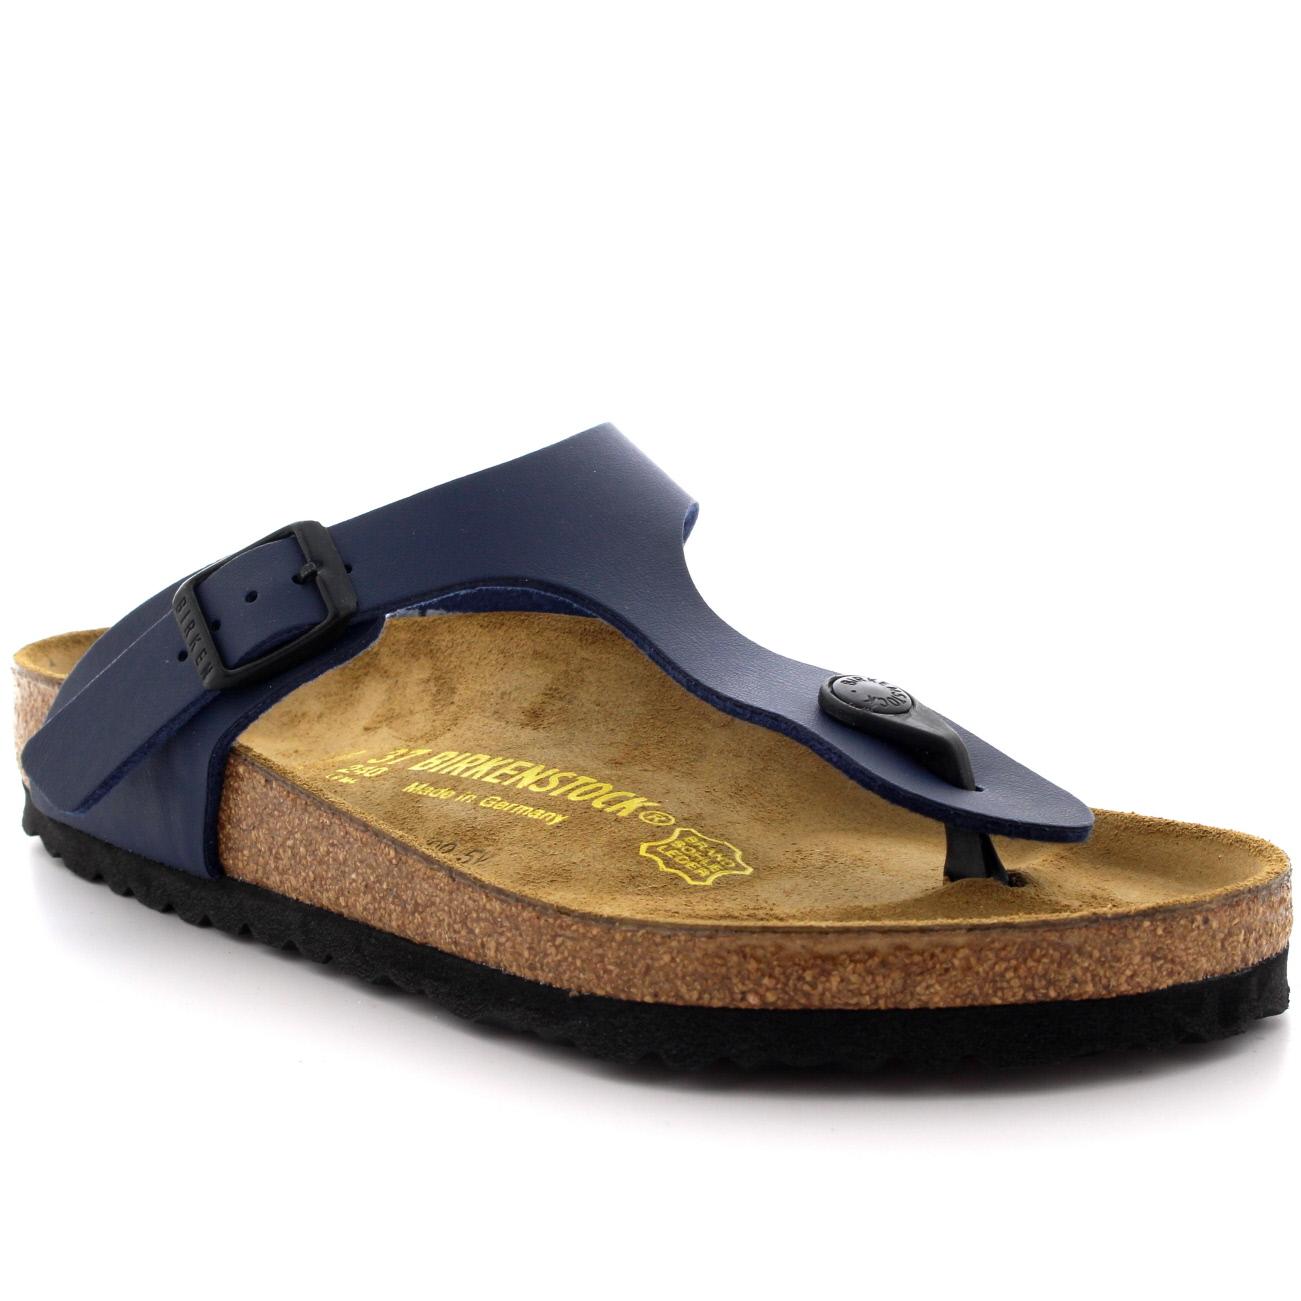 9e9d3fac8 Unisex Adults Birkenstock Gizeh Holiday T-Bar Open Toe Beach Sandals ...